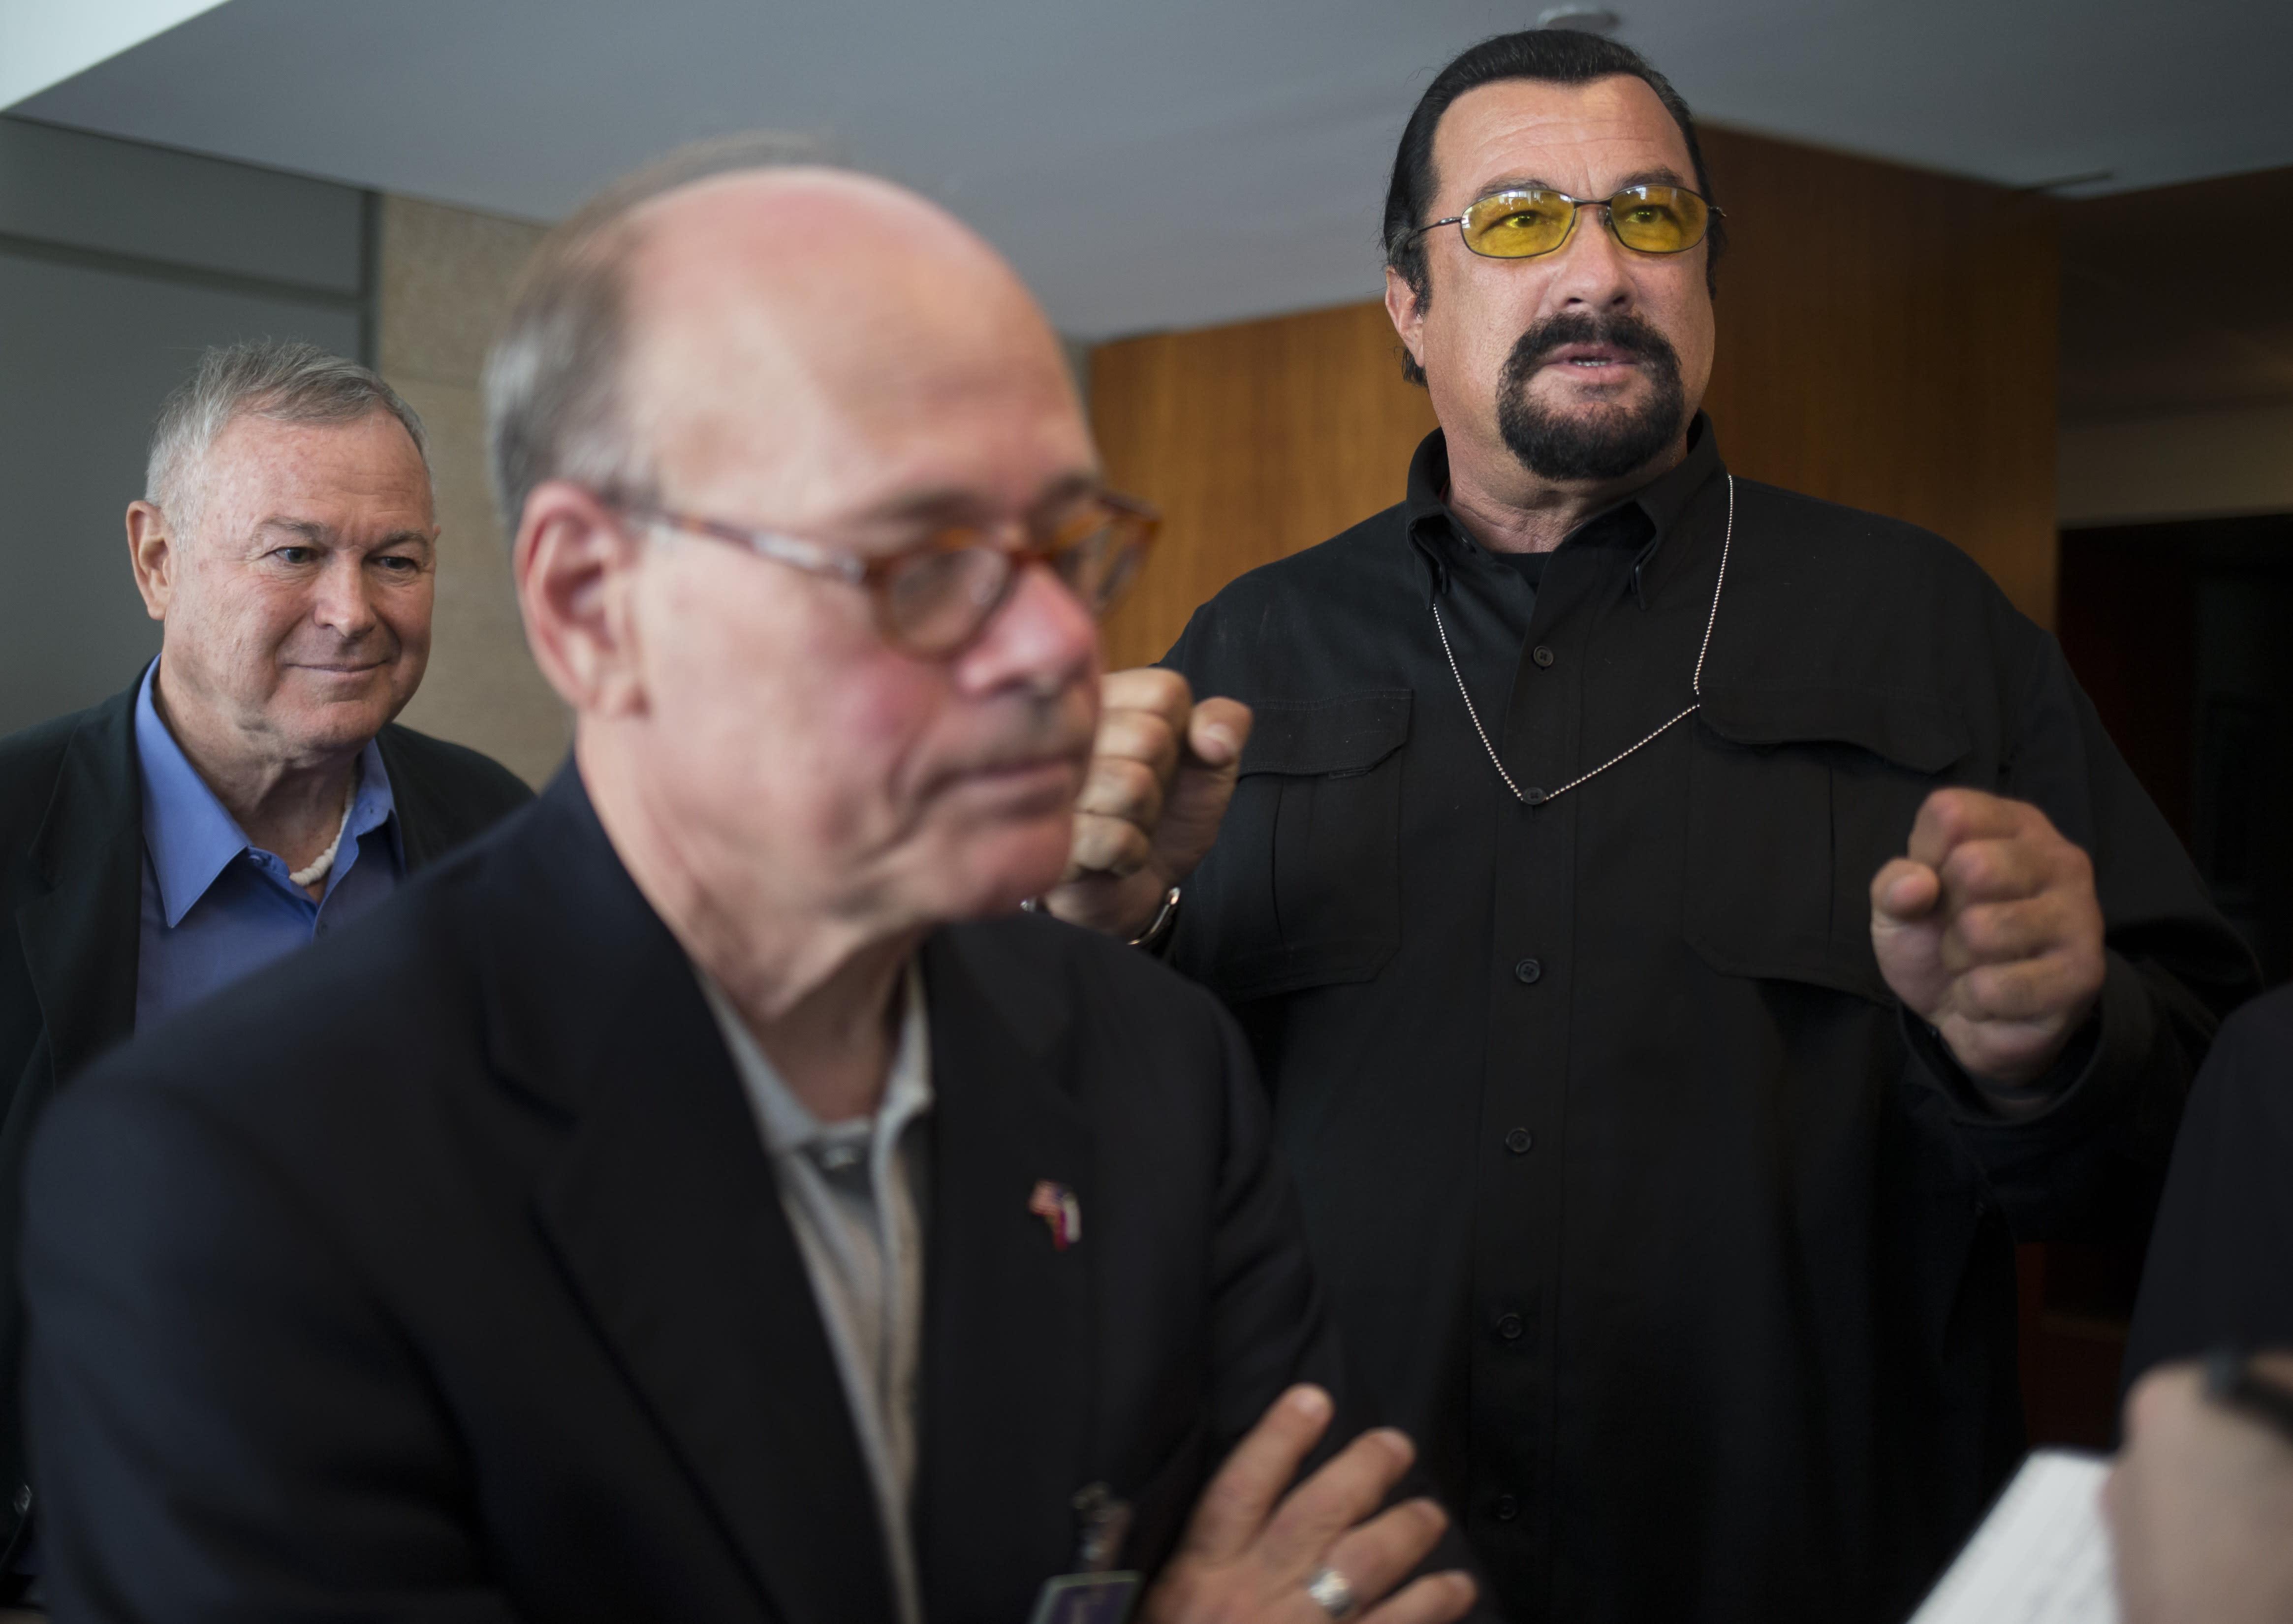 Congressmen find few Boston attack clues in Russia